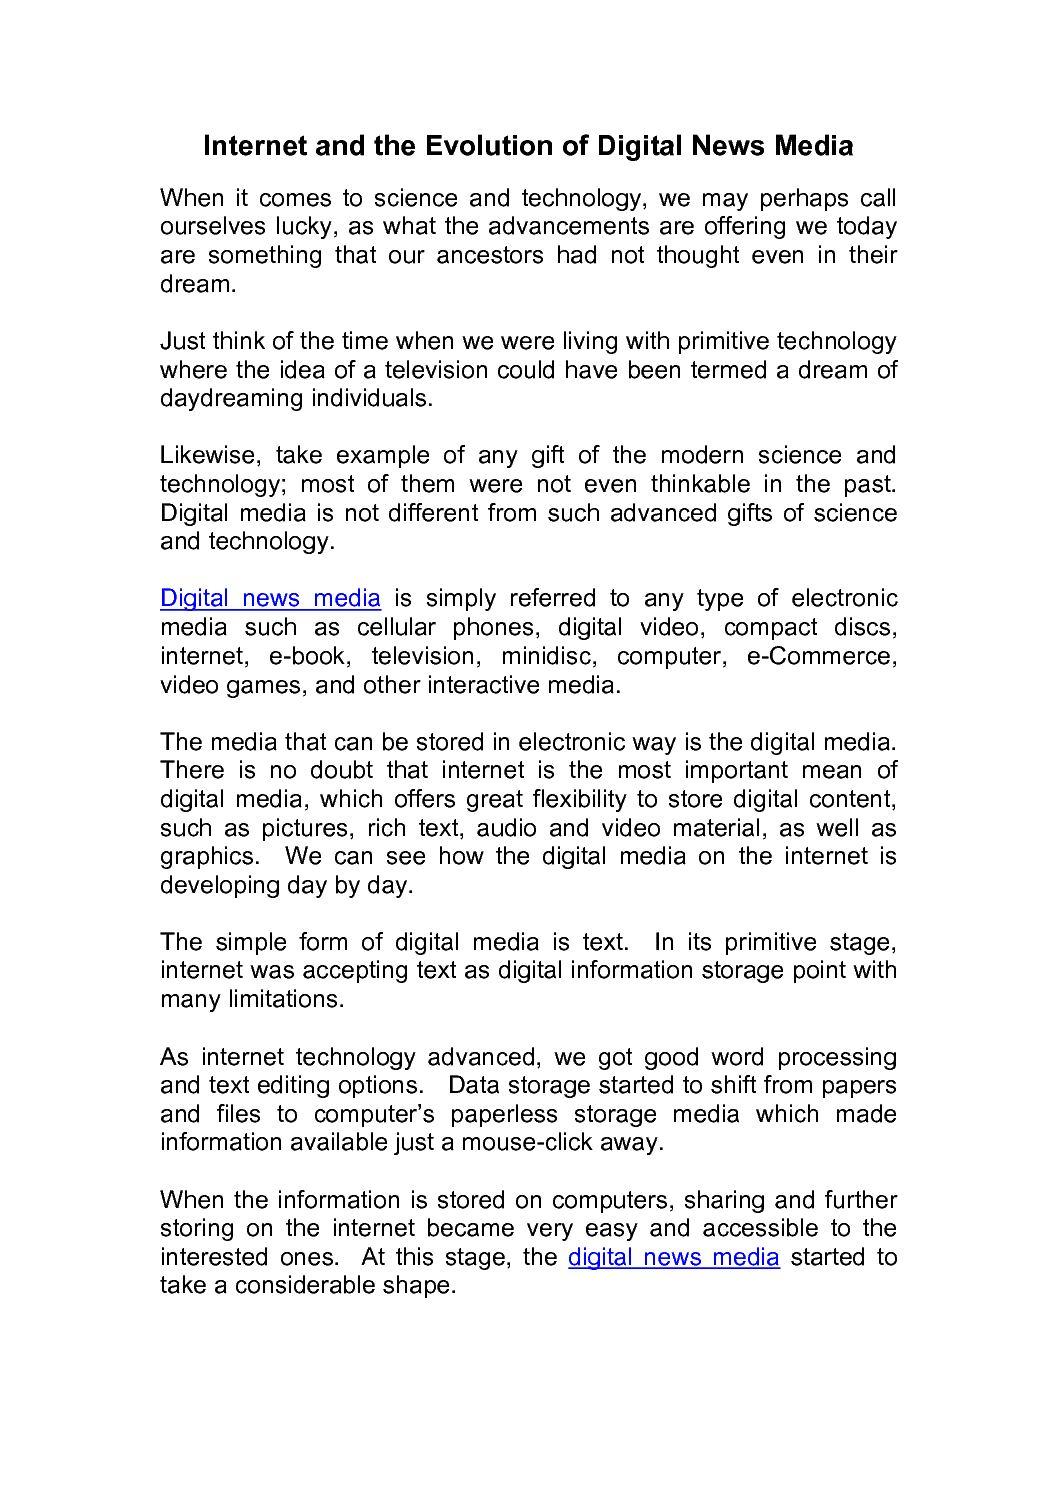 Calamo Seek4media On Internet And The Evolution Of Digital News Media